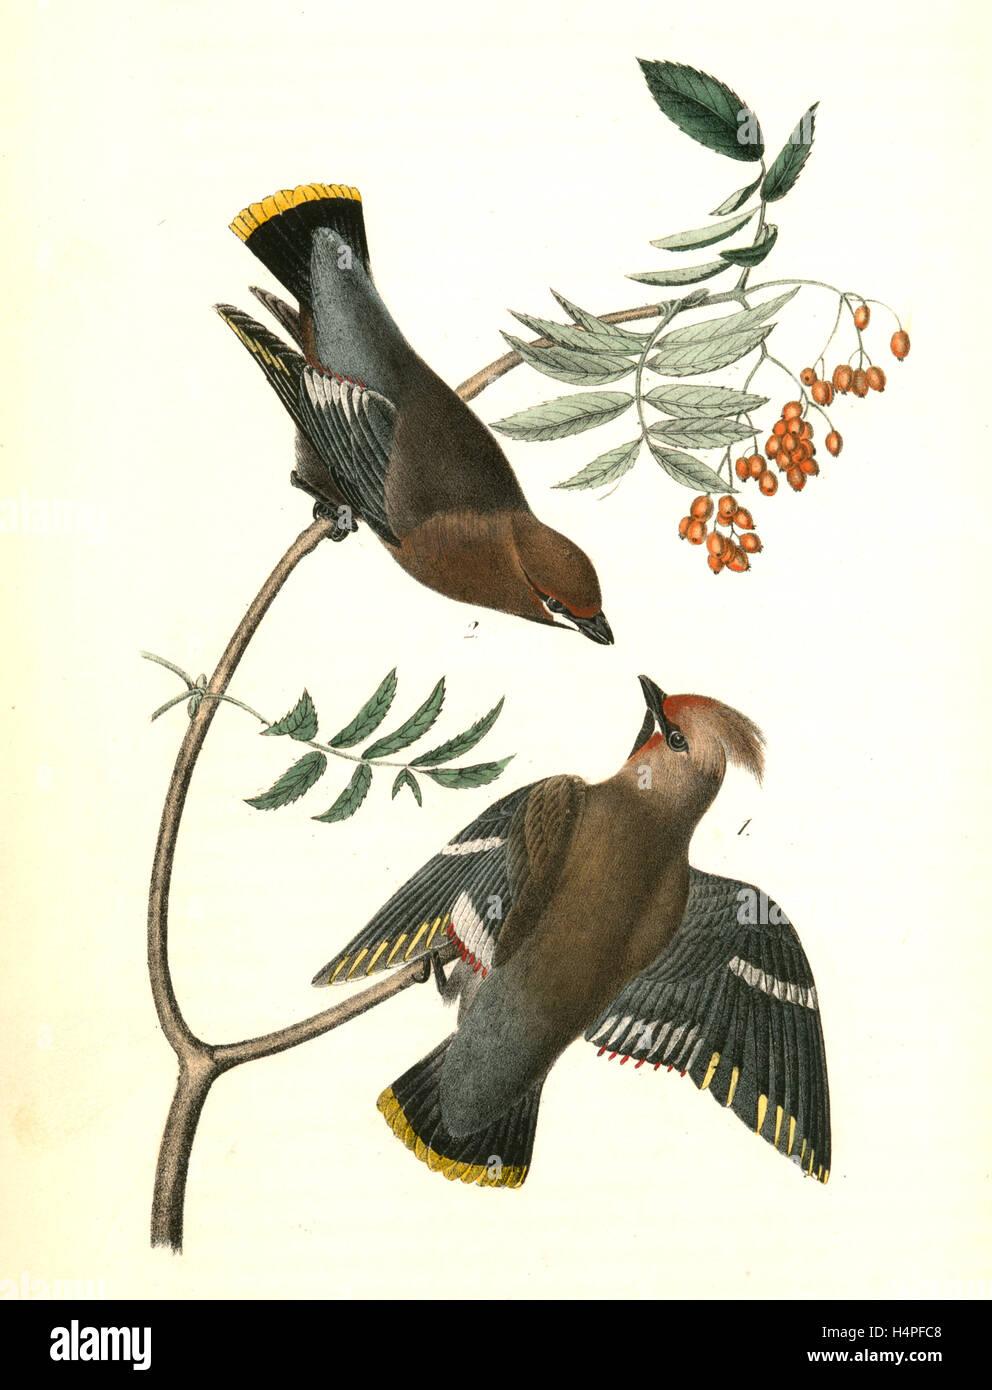 Black-throated cera-ALA, o Bohemian Chatterer. 1. Macho. 2. Hembra. Servicio Canadiense (árbol), John James Imagen De Stock